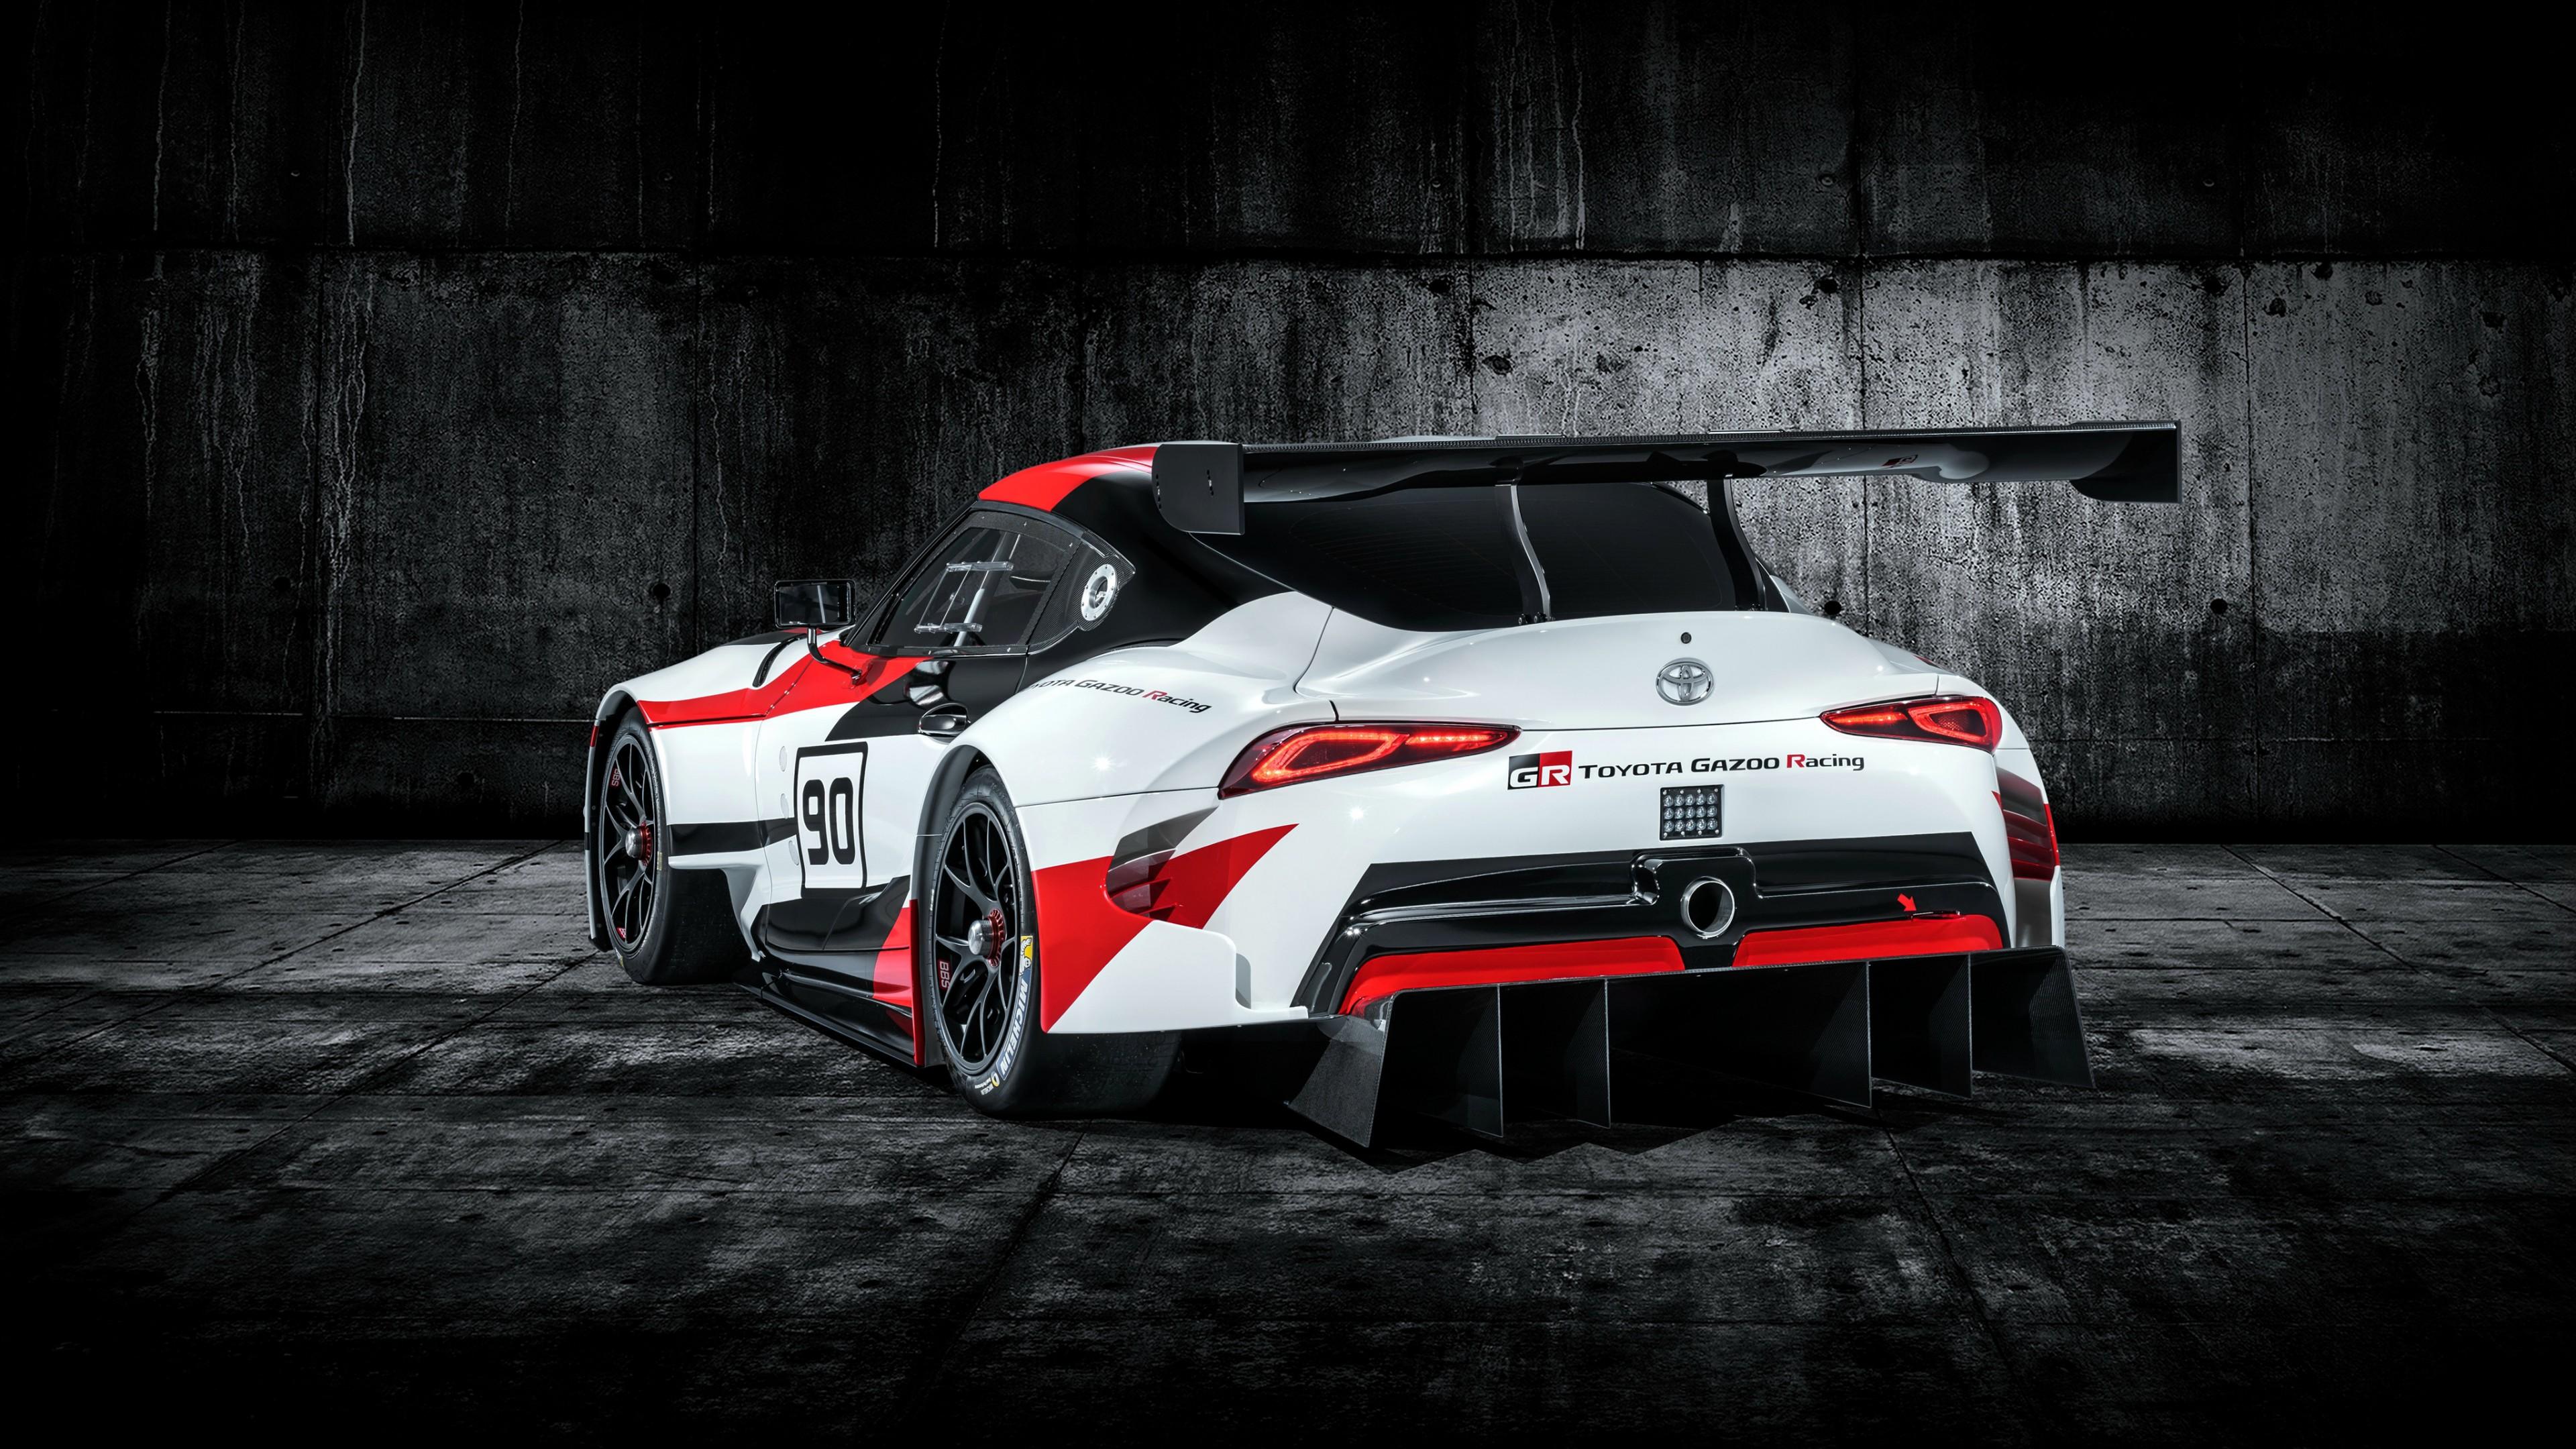 2018 Toyota GR Supra Racing Concept 4K 9 Wallpaper   HD ...